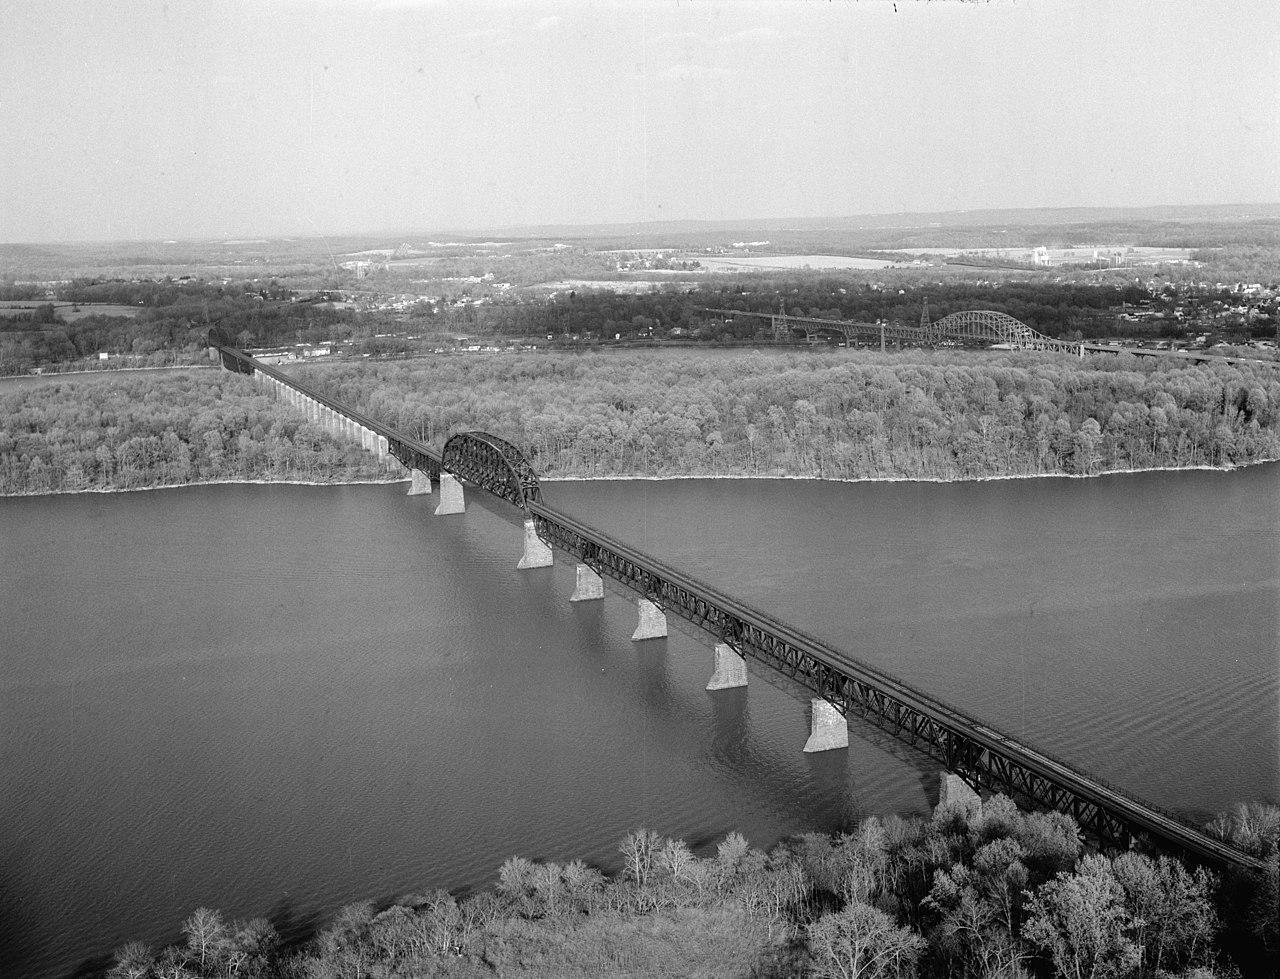 File:B&O Railroad 1908 Susquehanna River Bridge (West End).jpg - Wikimedia Commons